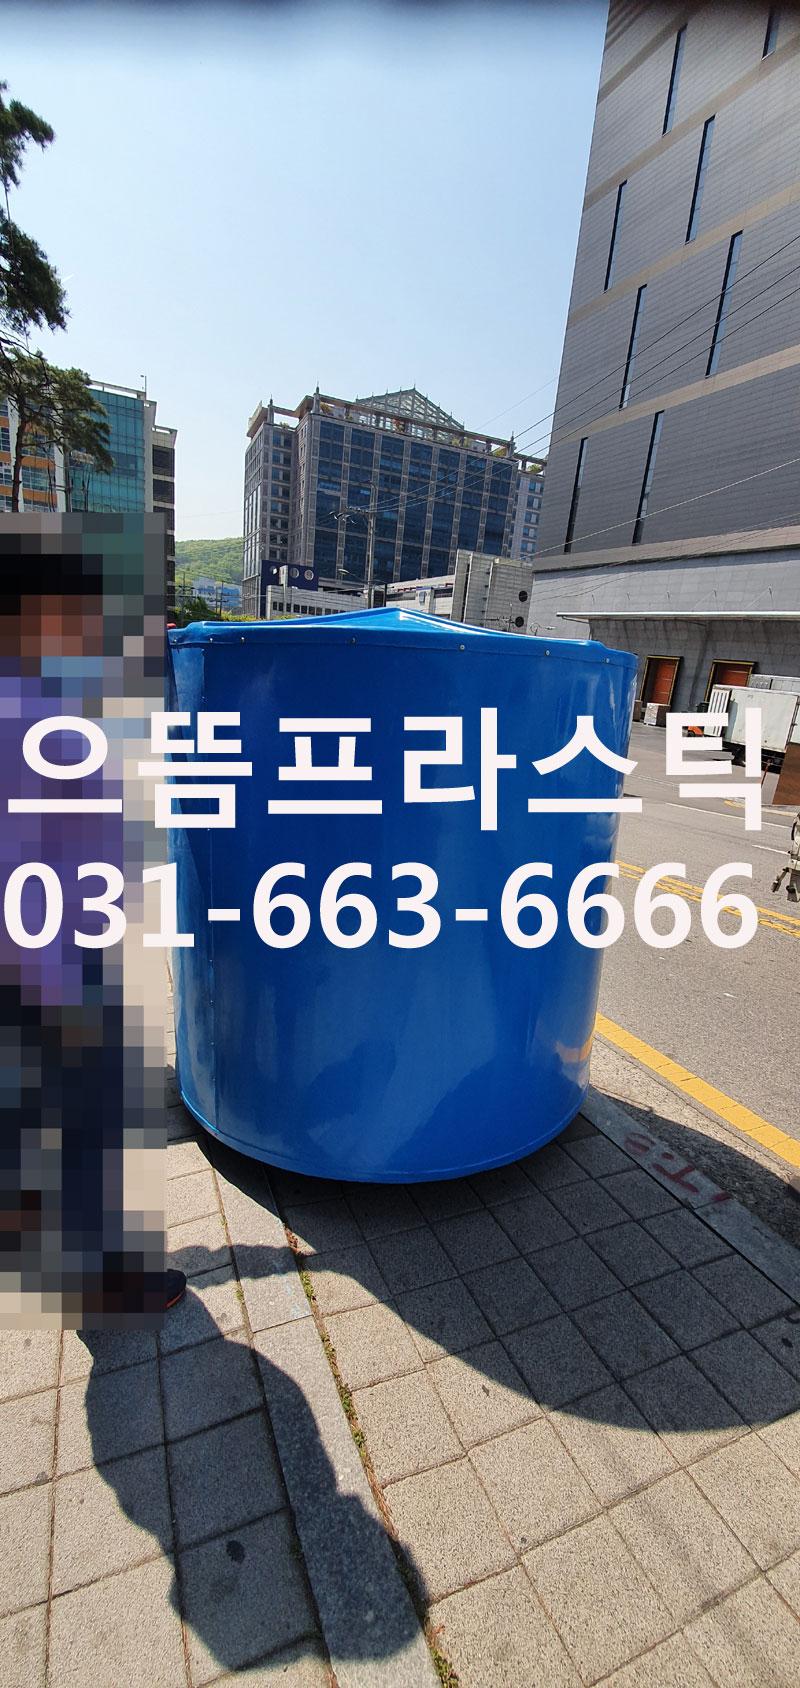 14b47a657e0d80781a5642ef85c08183_1622169109_0352.jpg